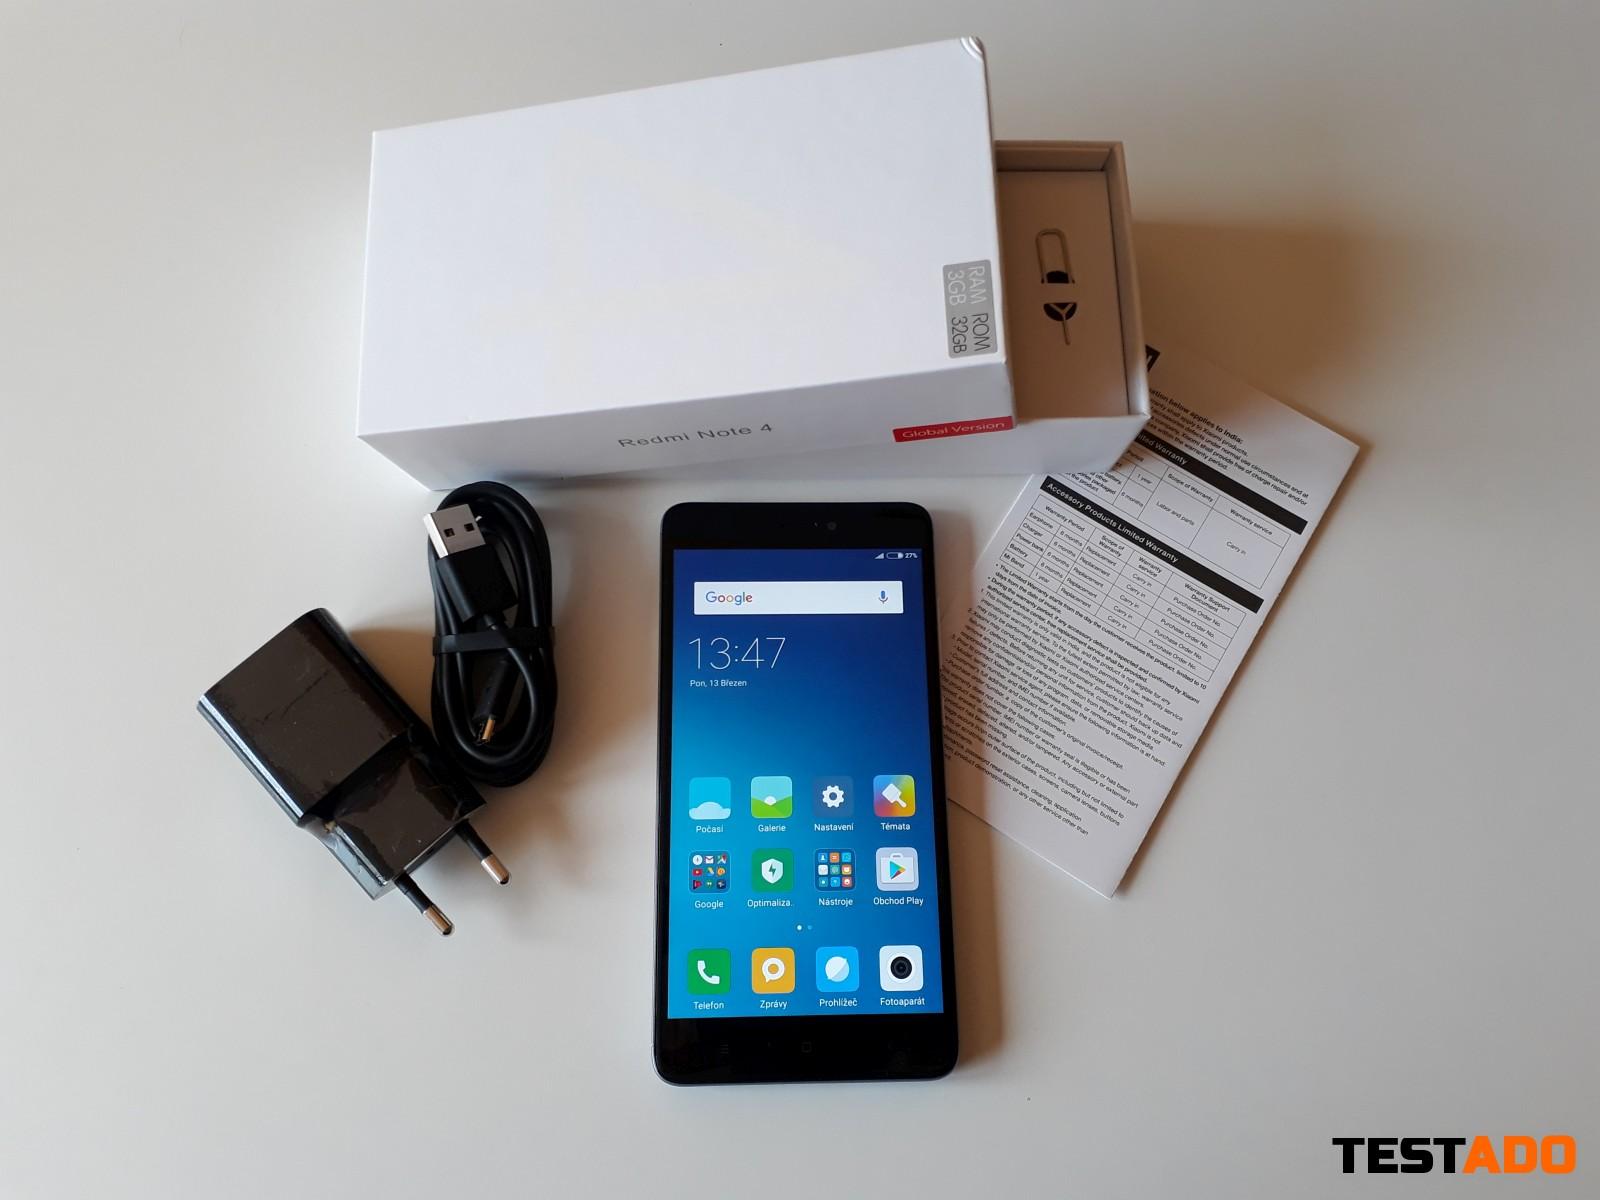 Recenze Xiaomi Redmi Note 4 Global obsah balen Recenze Xiaomi Redmi Note 4 Global obsah balen